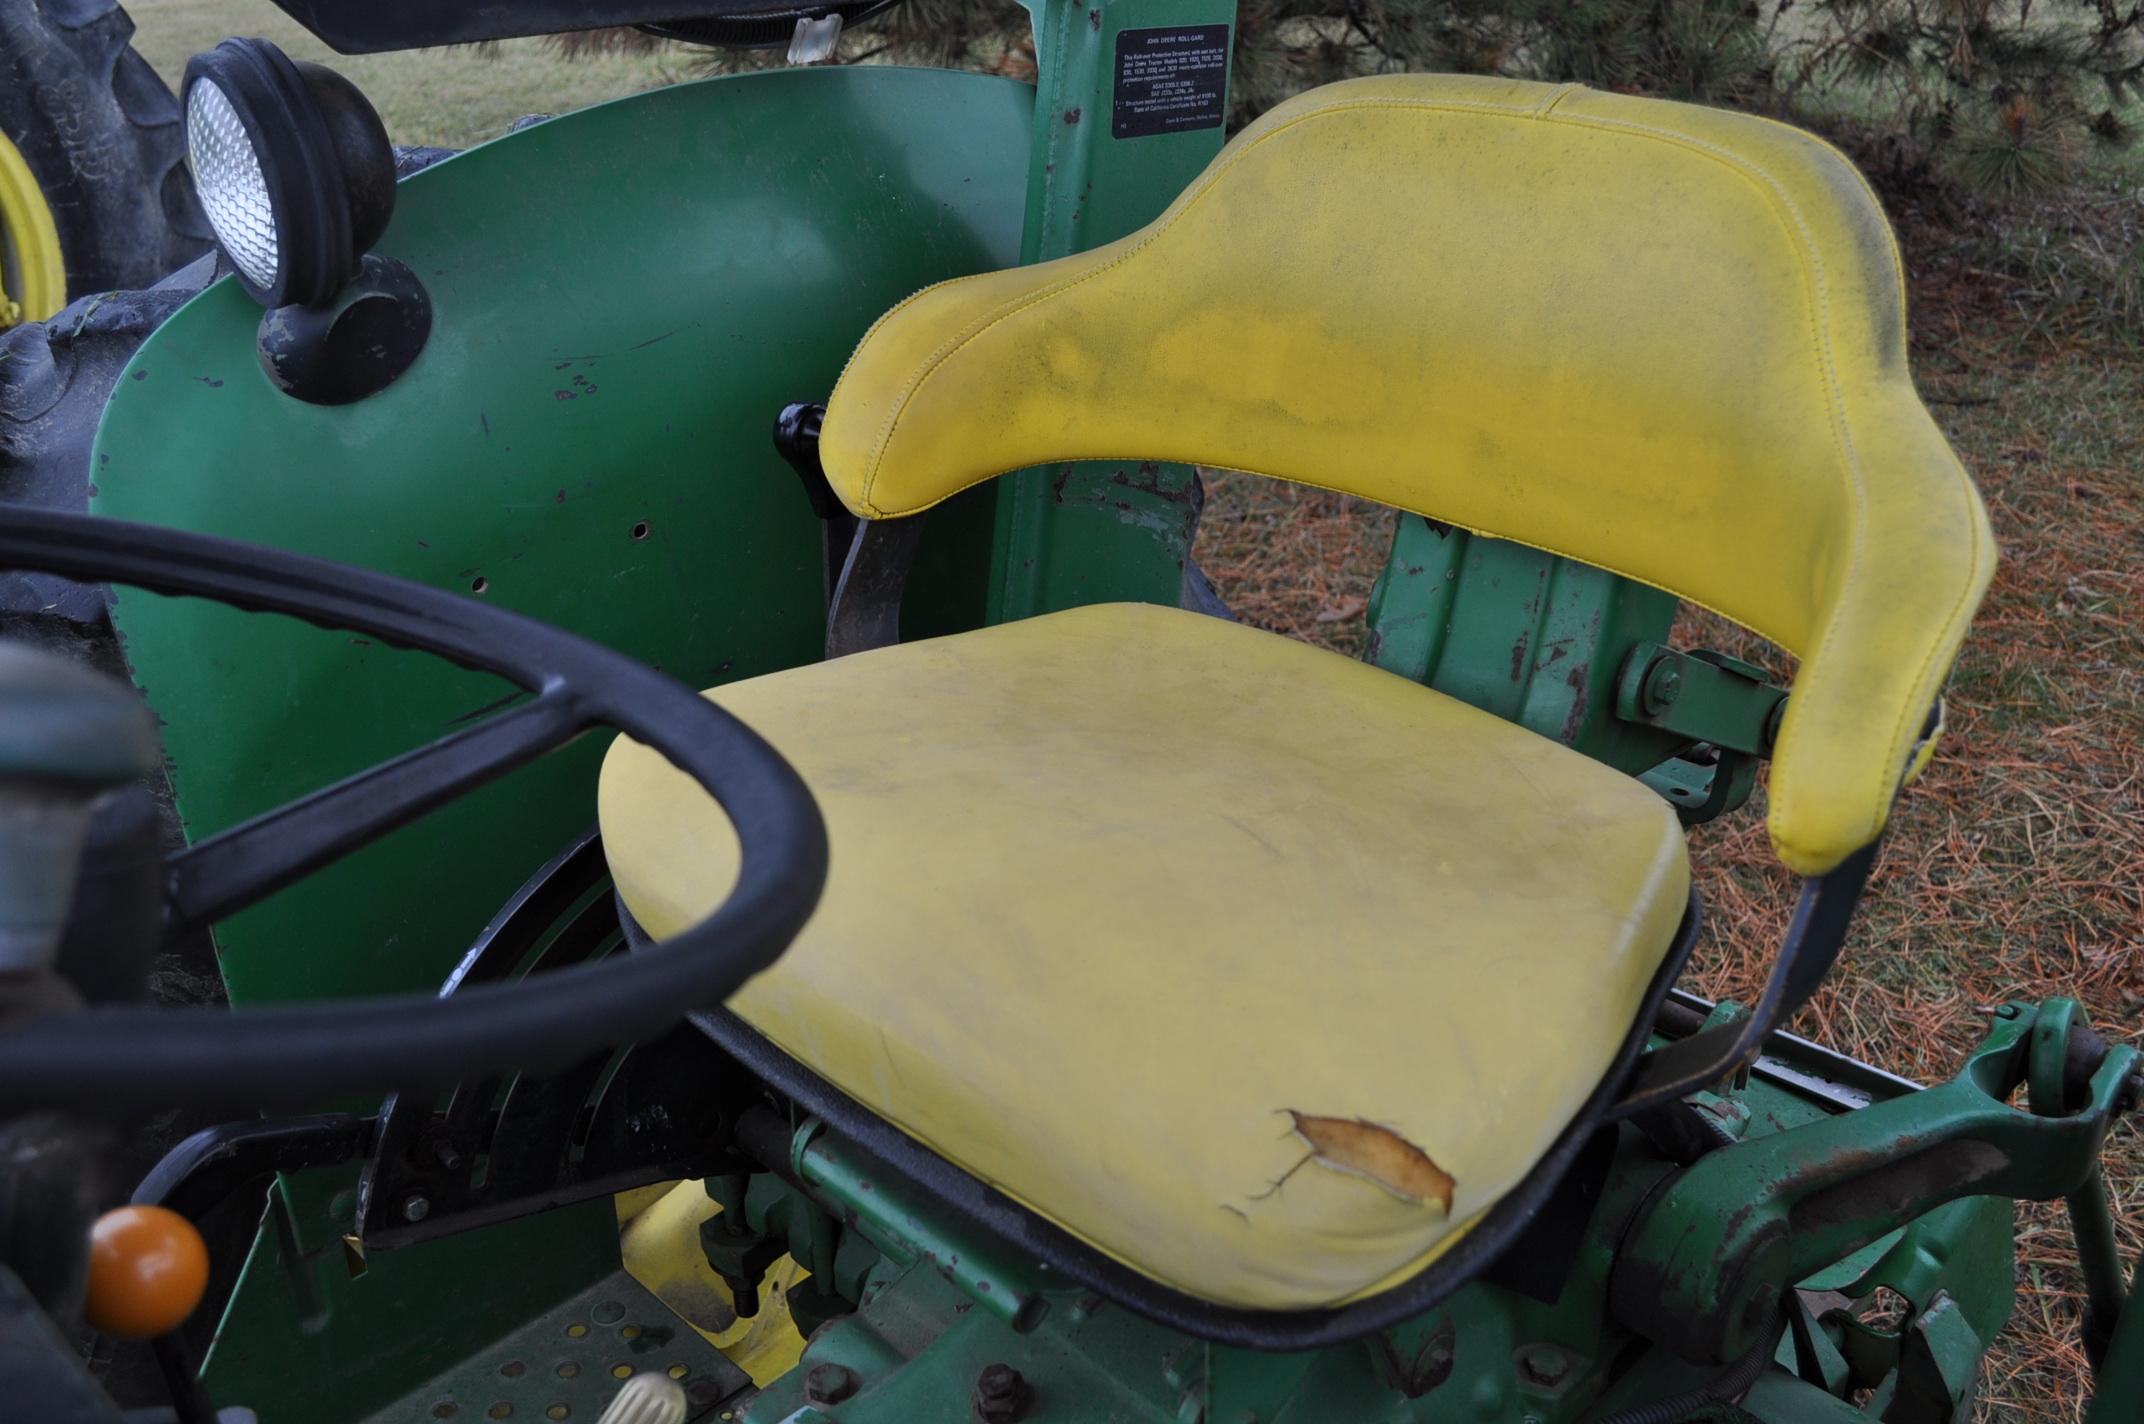 John Deere 2630 tractor, diesel, 16.9-28 rear, 9.5-15 front, 1 hyd remote, 540 pto, 3 pt, 4260 - Image 17 of 18